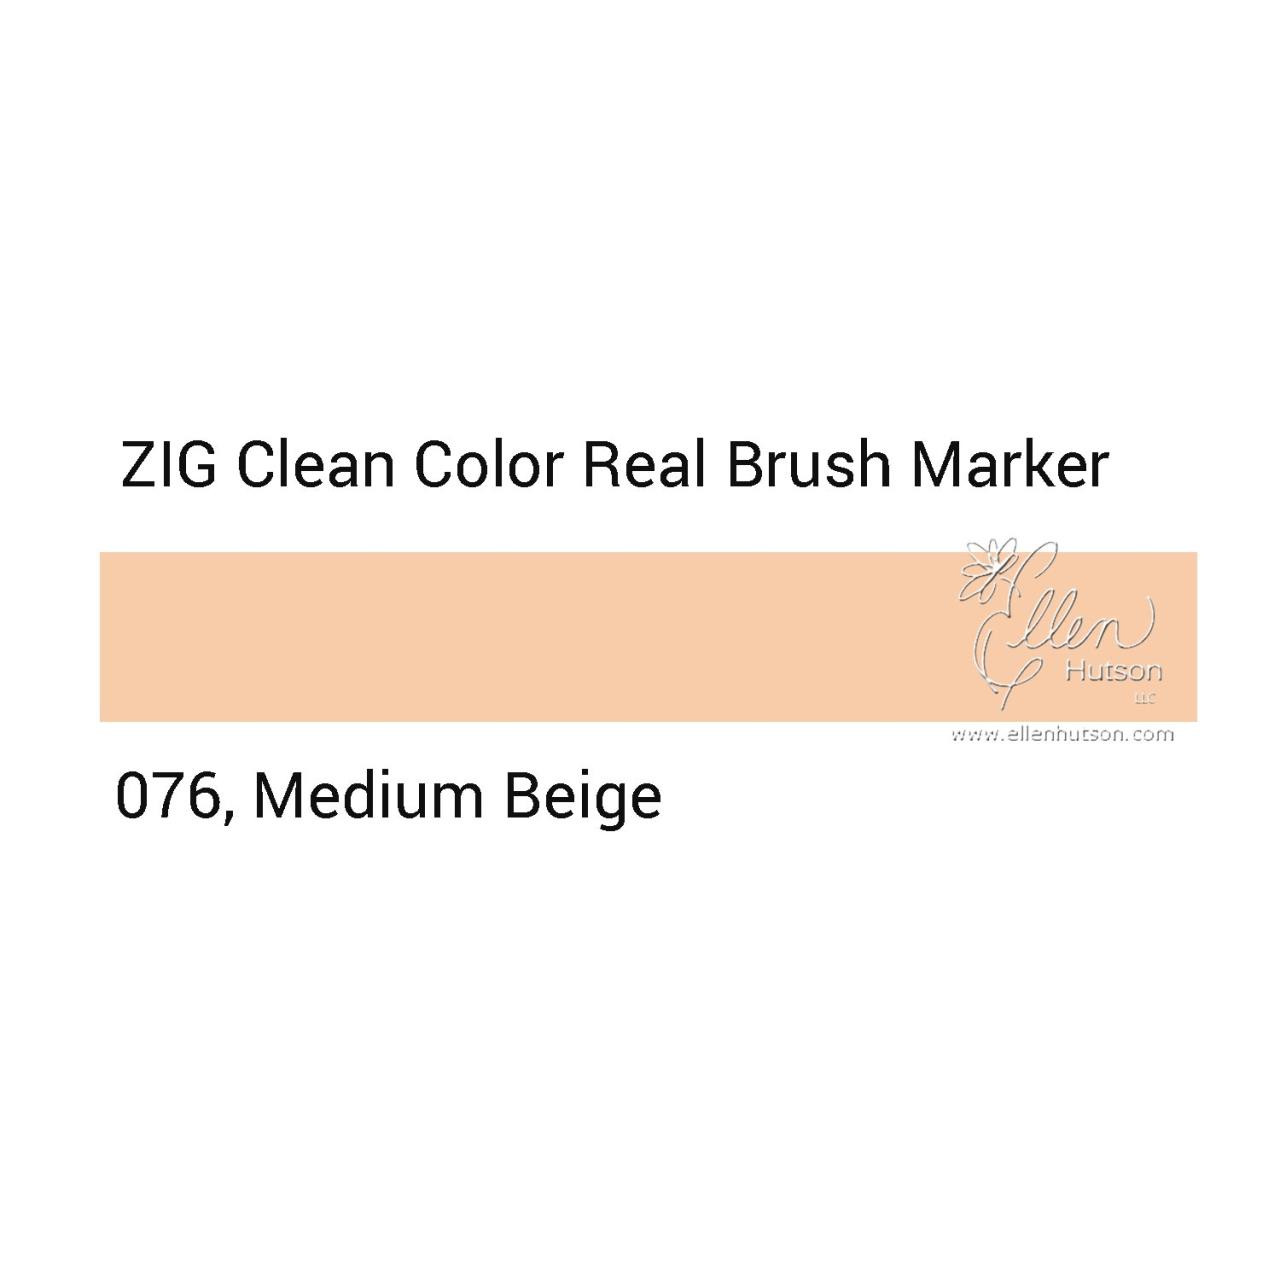 076 - Medium Beige, ZIG Clean Color Real Brush Marker - 847340037101